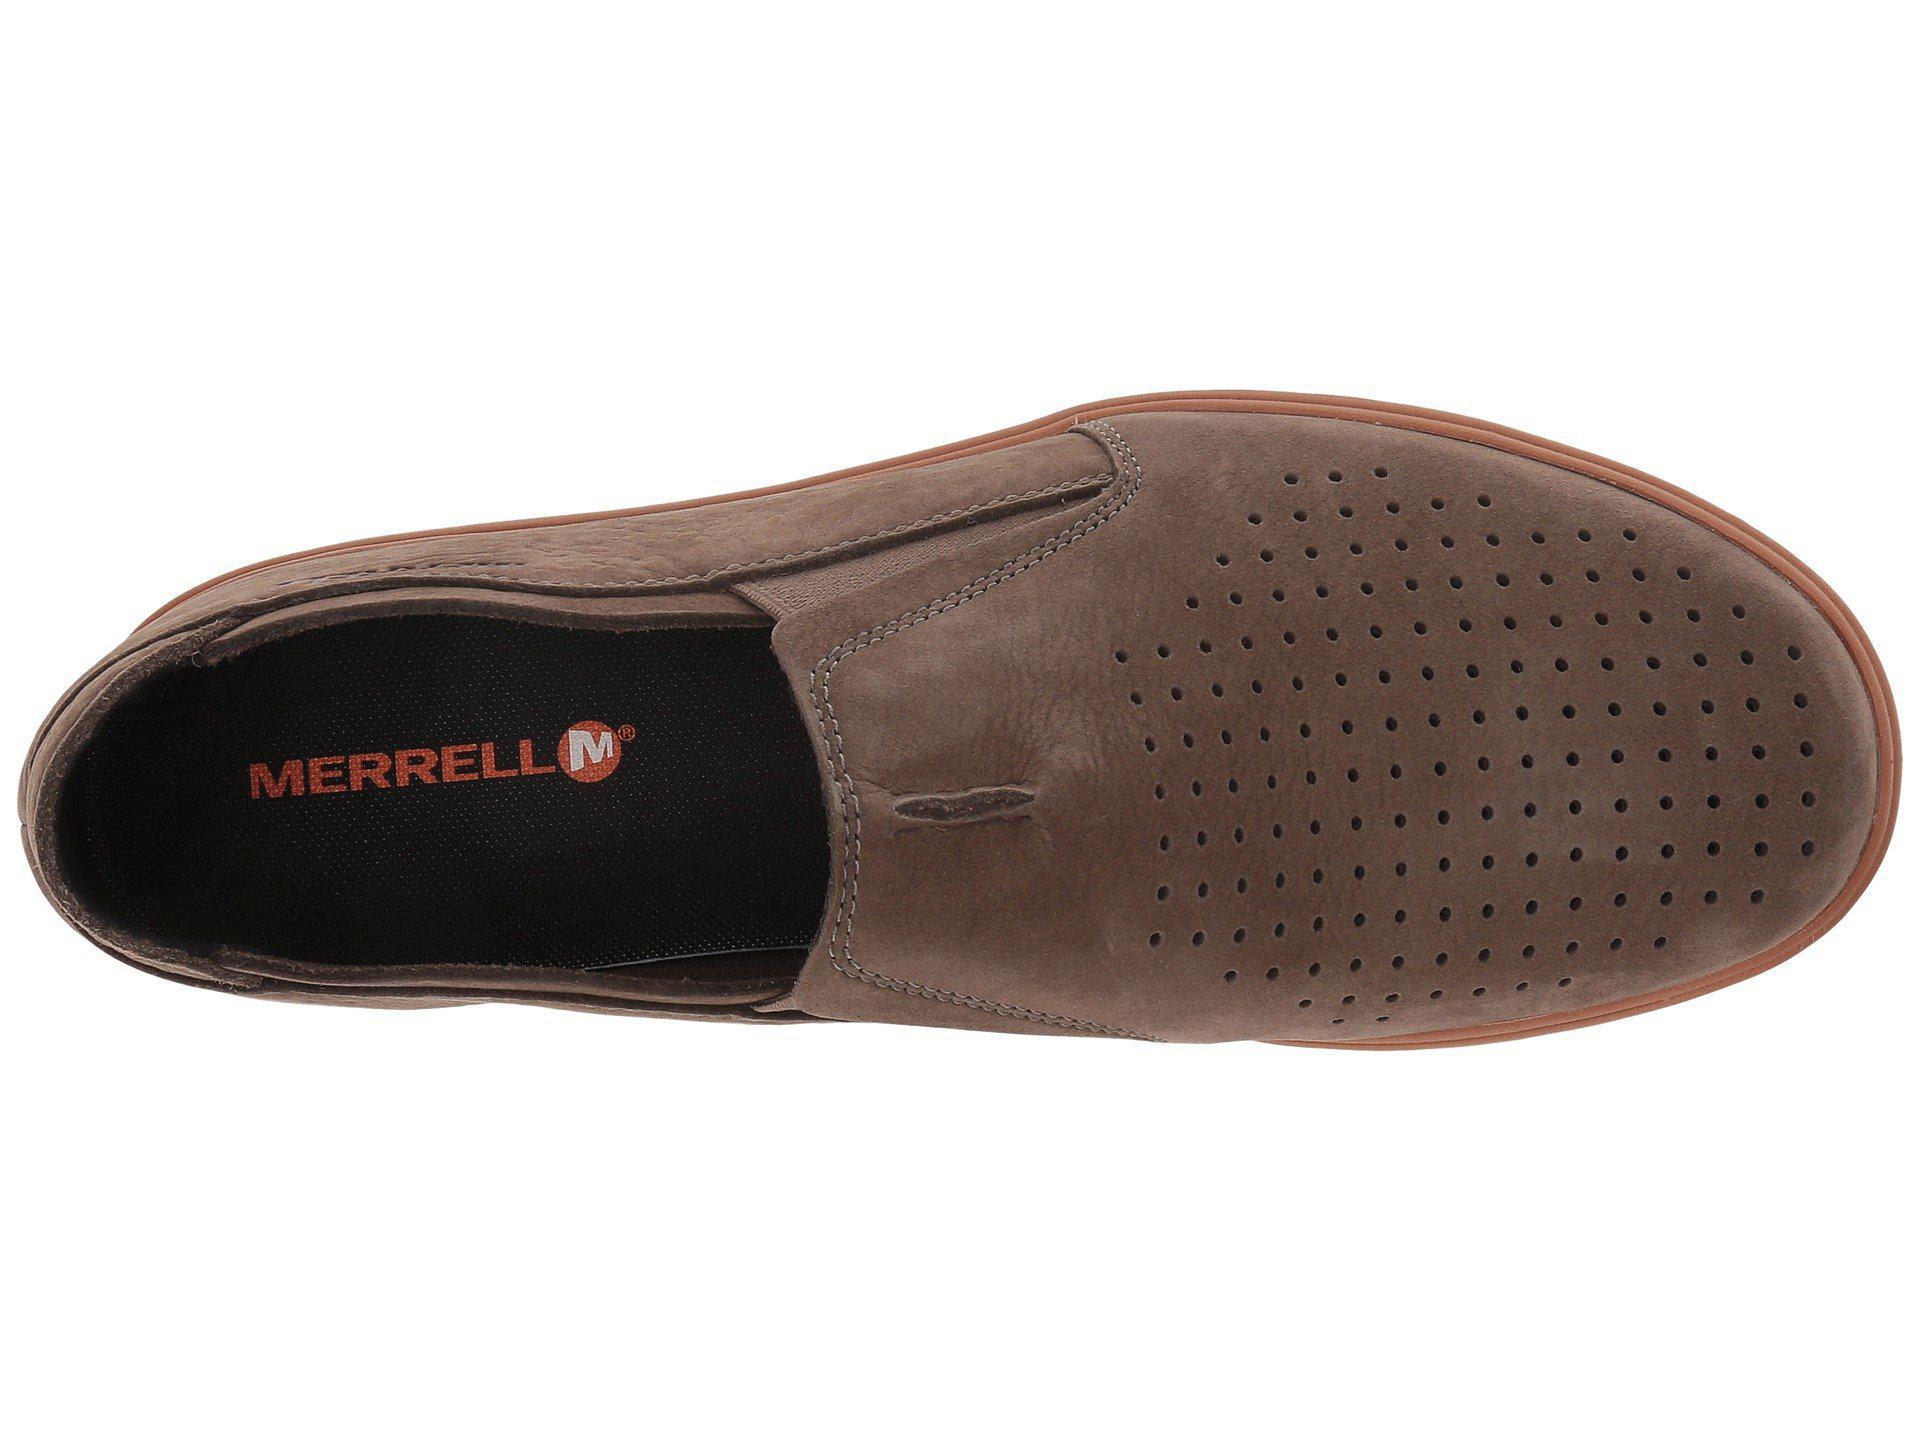 4cf9bd00f3e2e Merrell - Brown Downtown Moc (slate) Men's Shoes for Men - Lyst. View  fullscreen